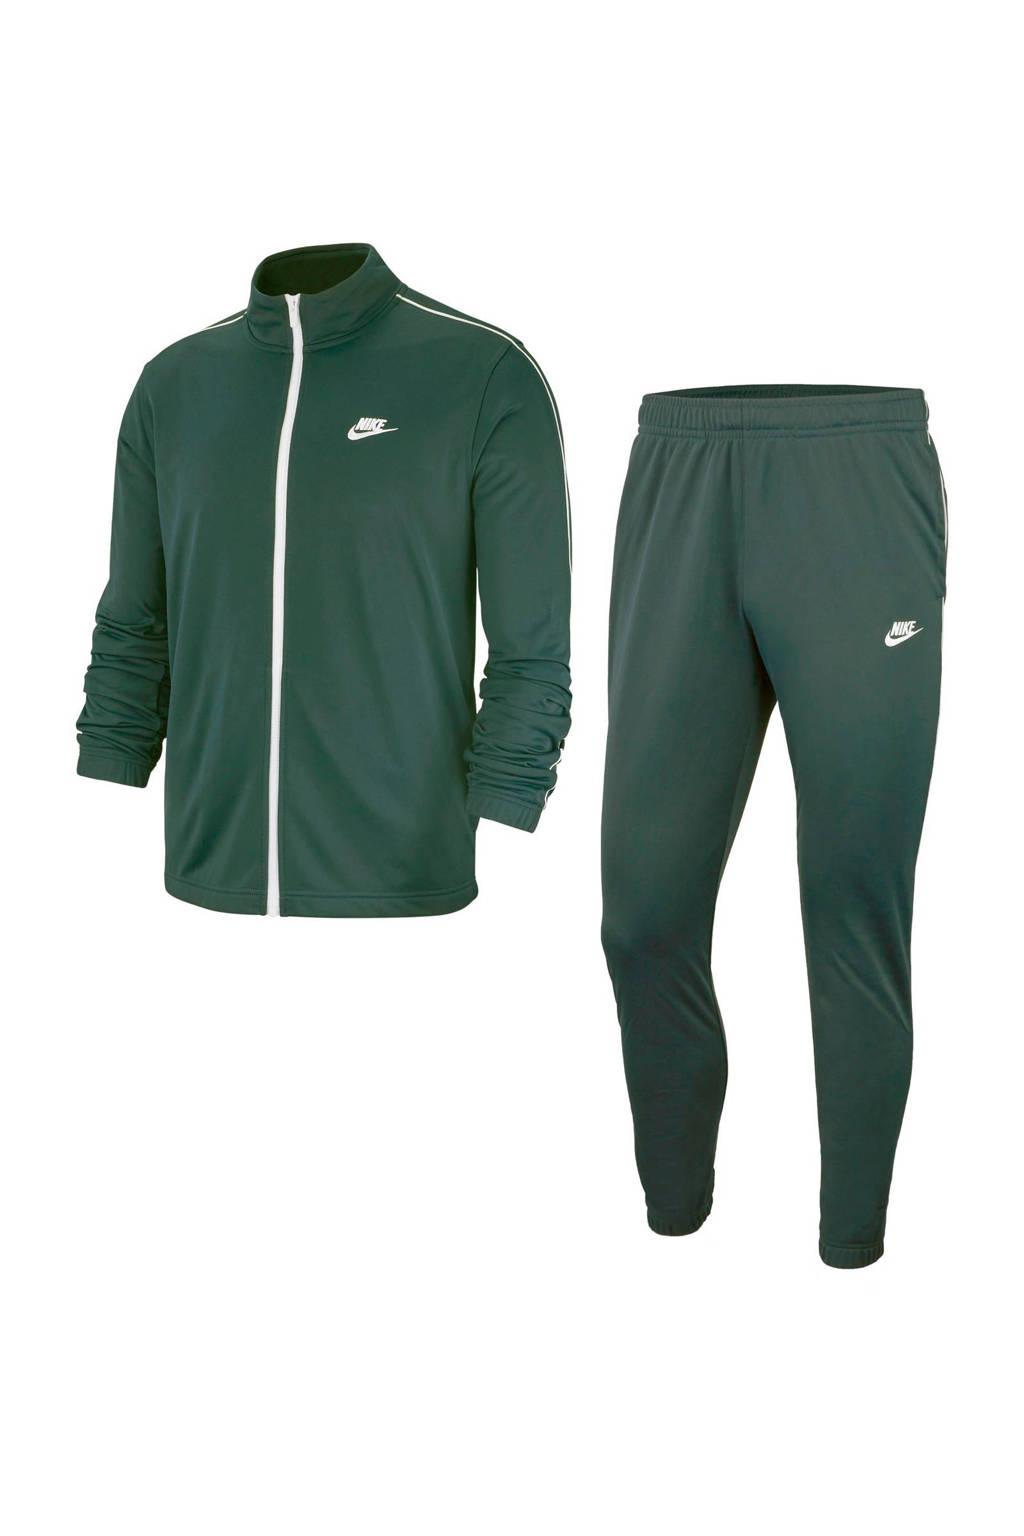 Nike   trainingspak groen, Groen